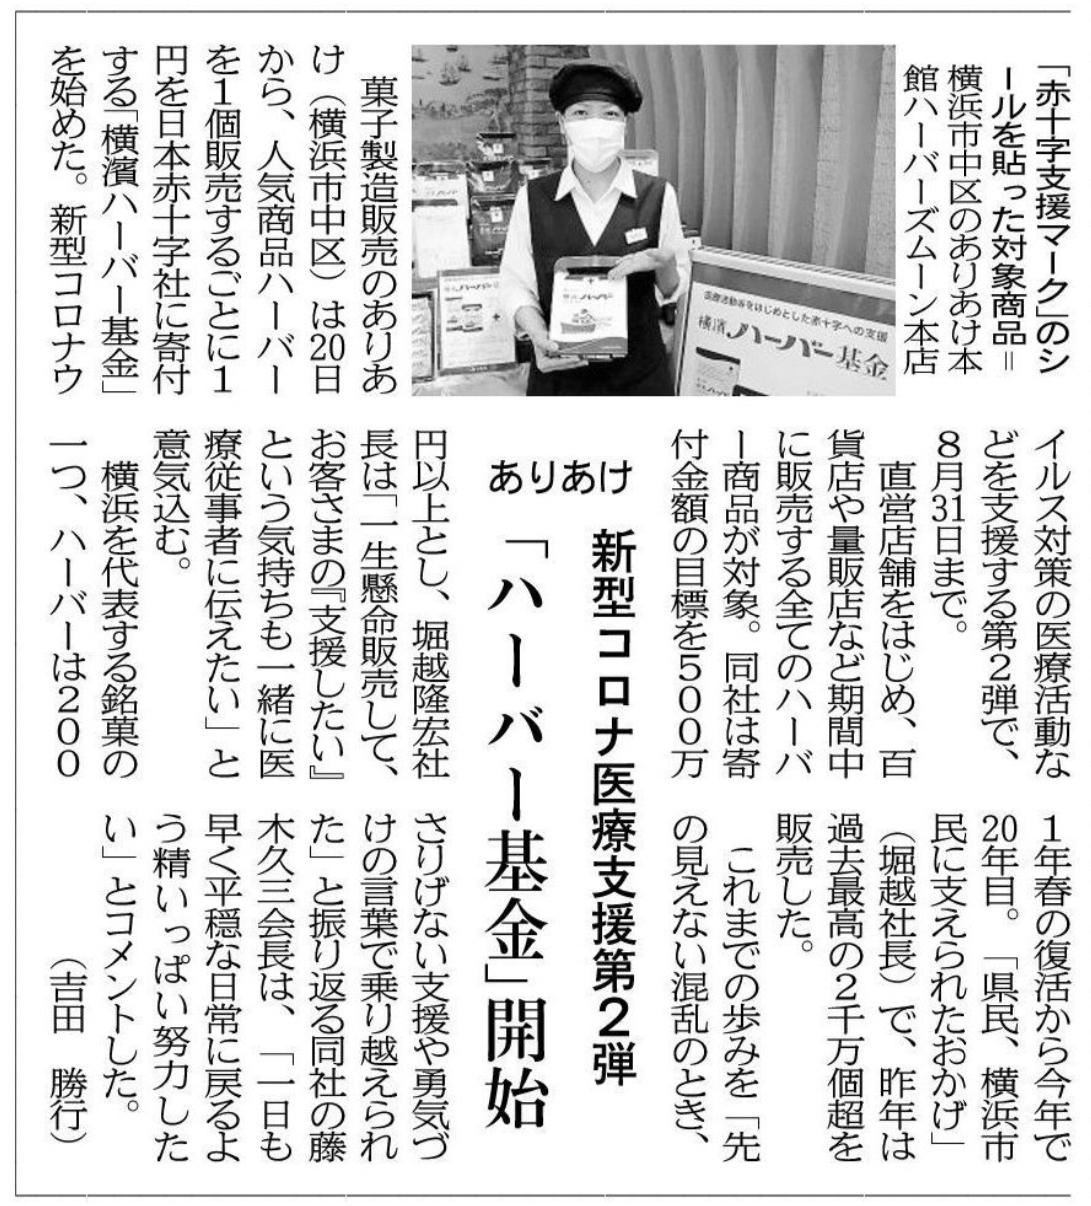 2020年5月23日 神奈川新聞「新型コロナ医療支援第2弾 ハーバー基金開始」記事掲載